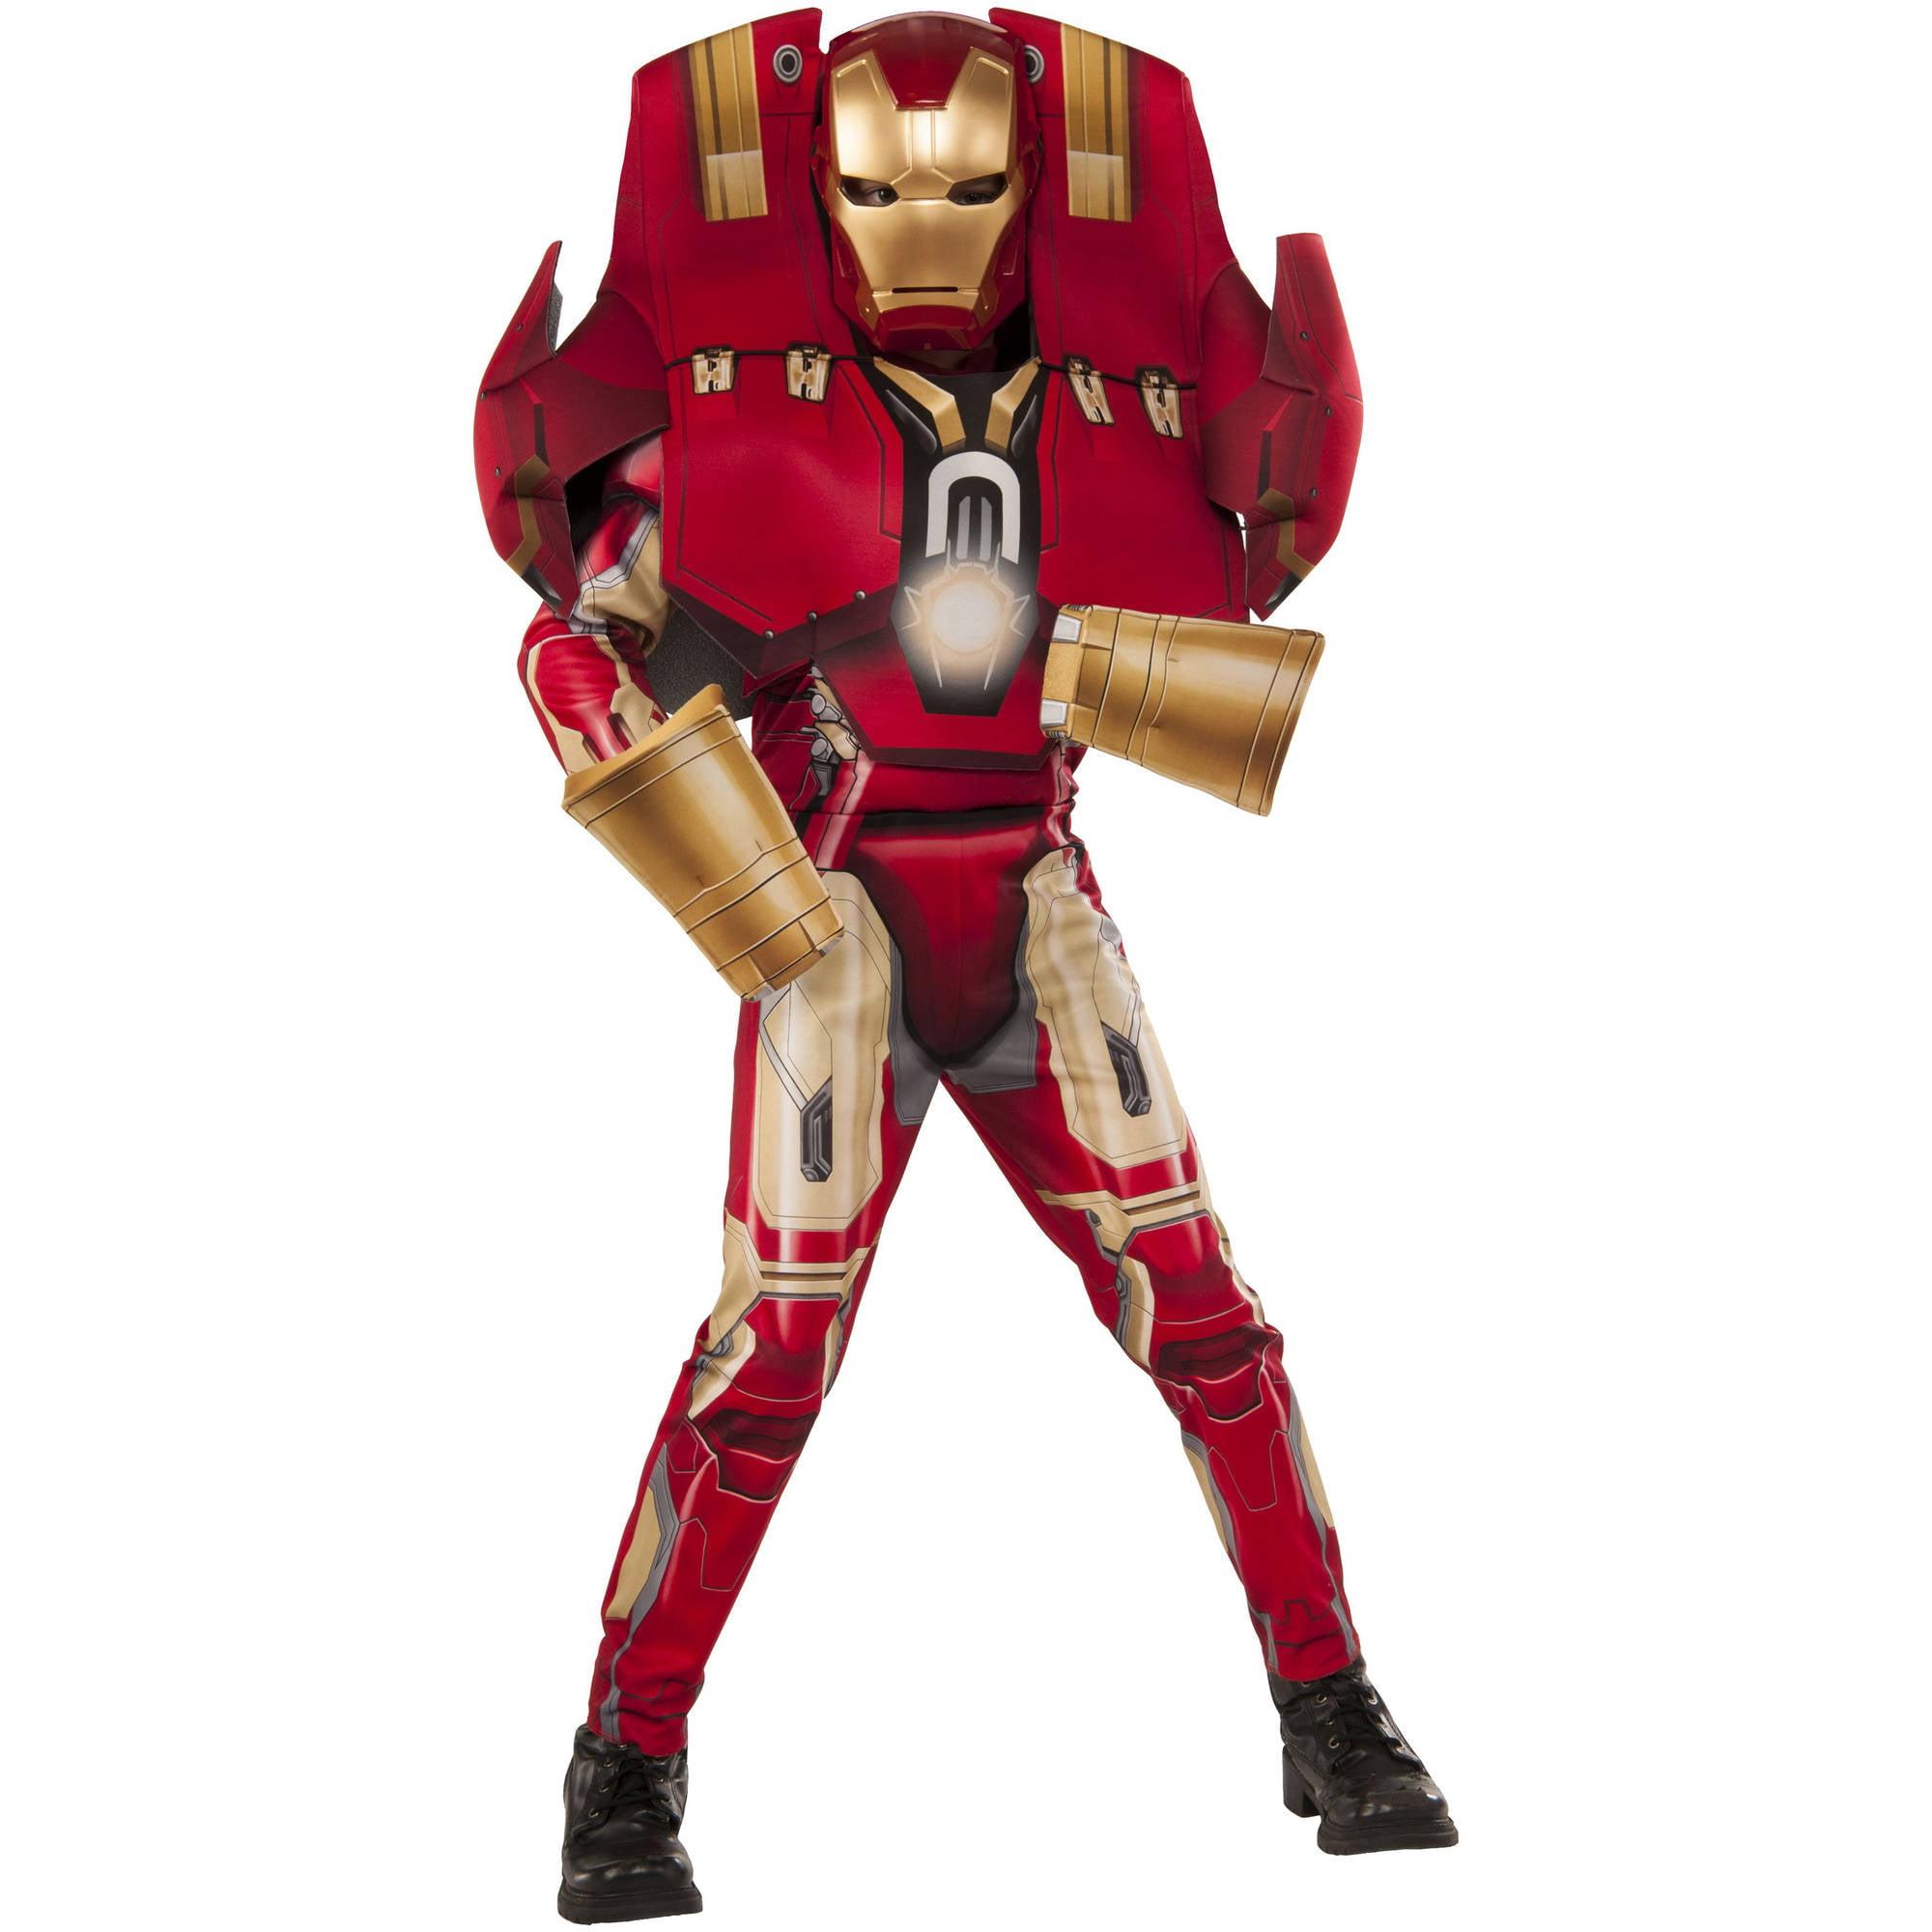 avengers hulk buster halloween costume accessory - walmart